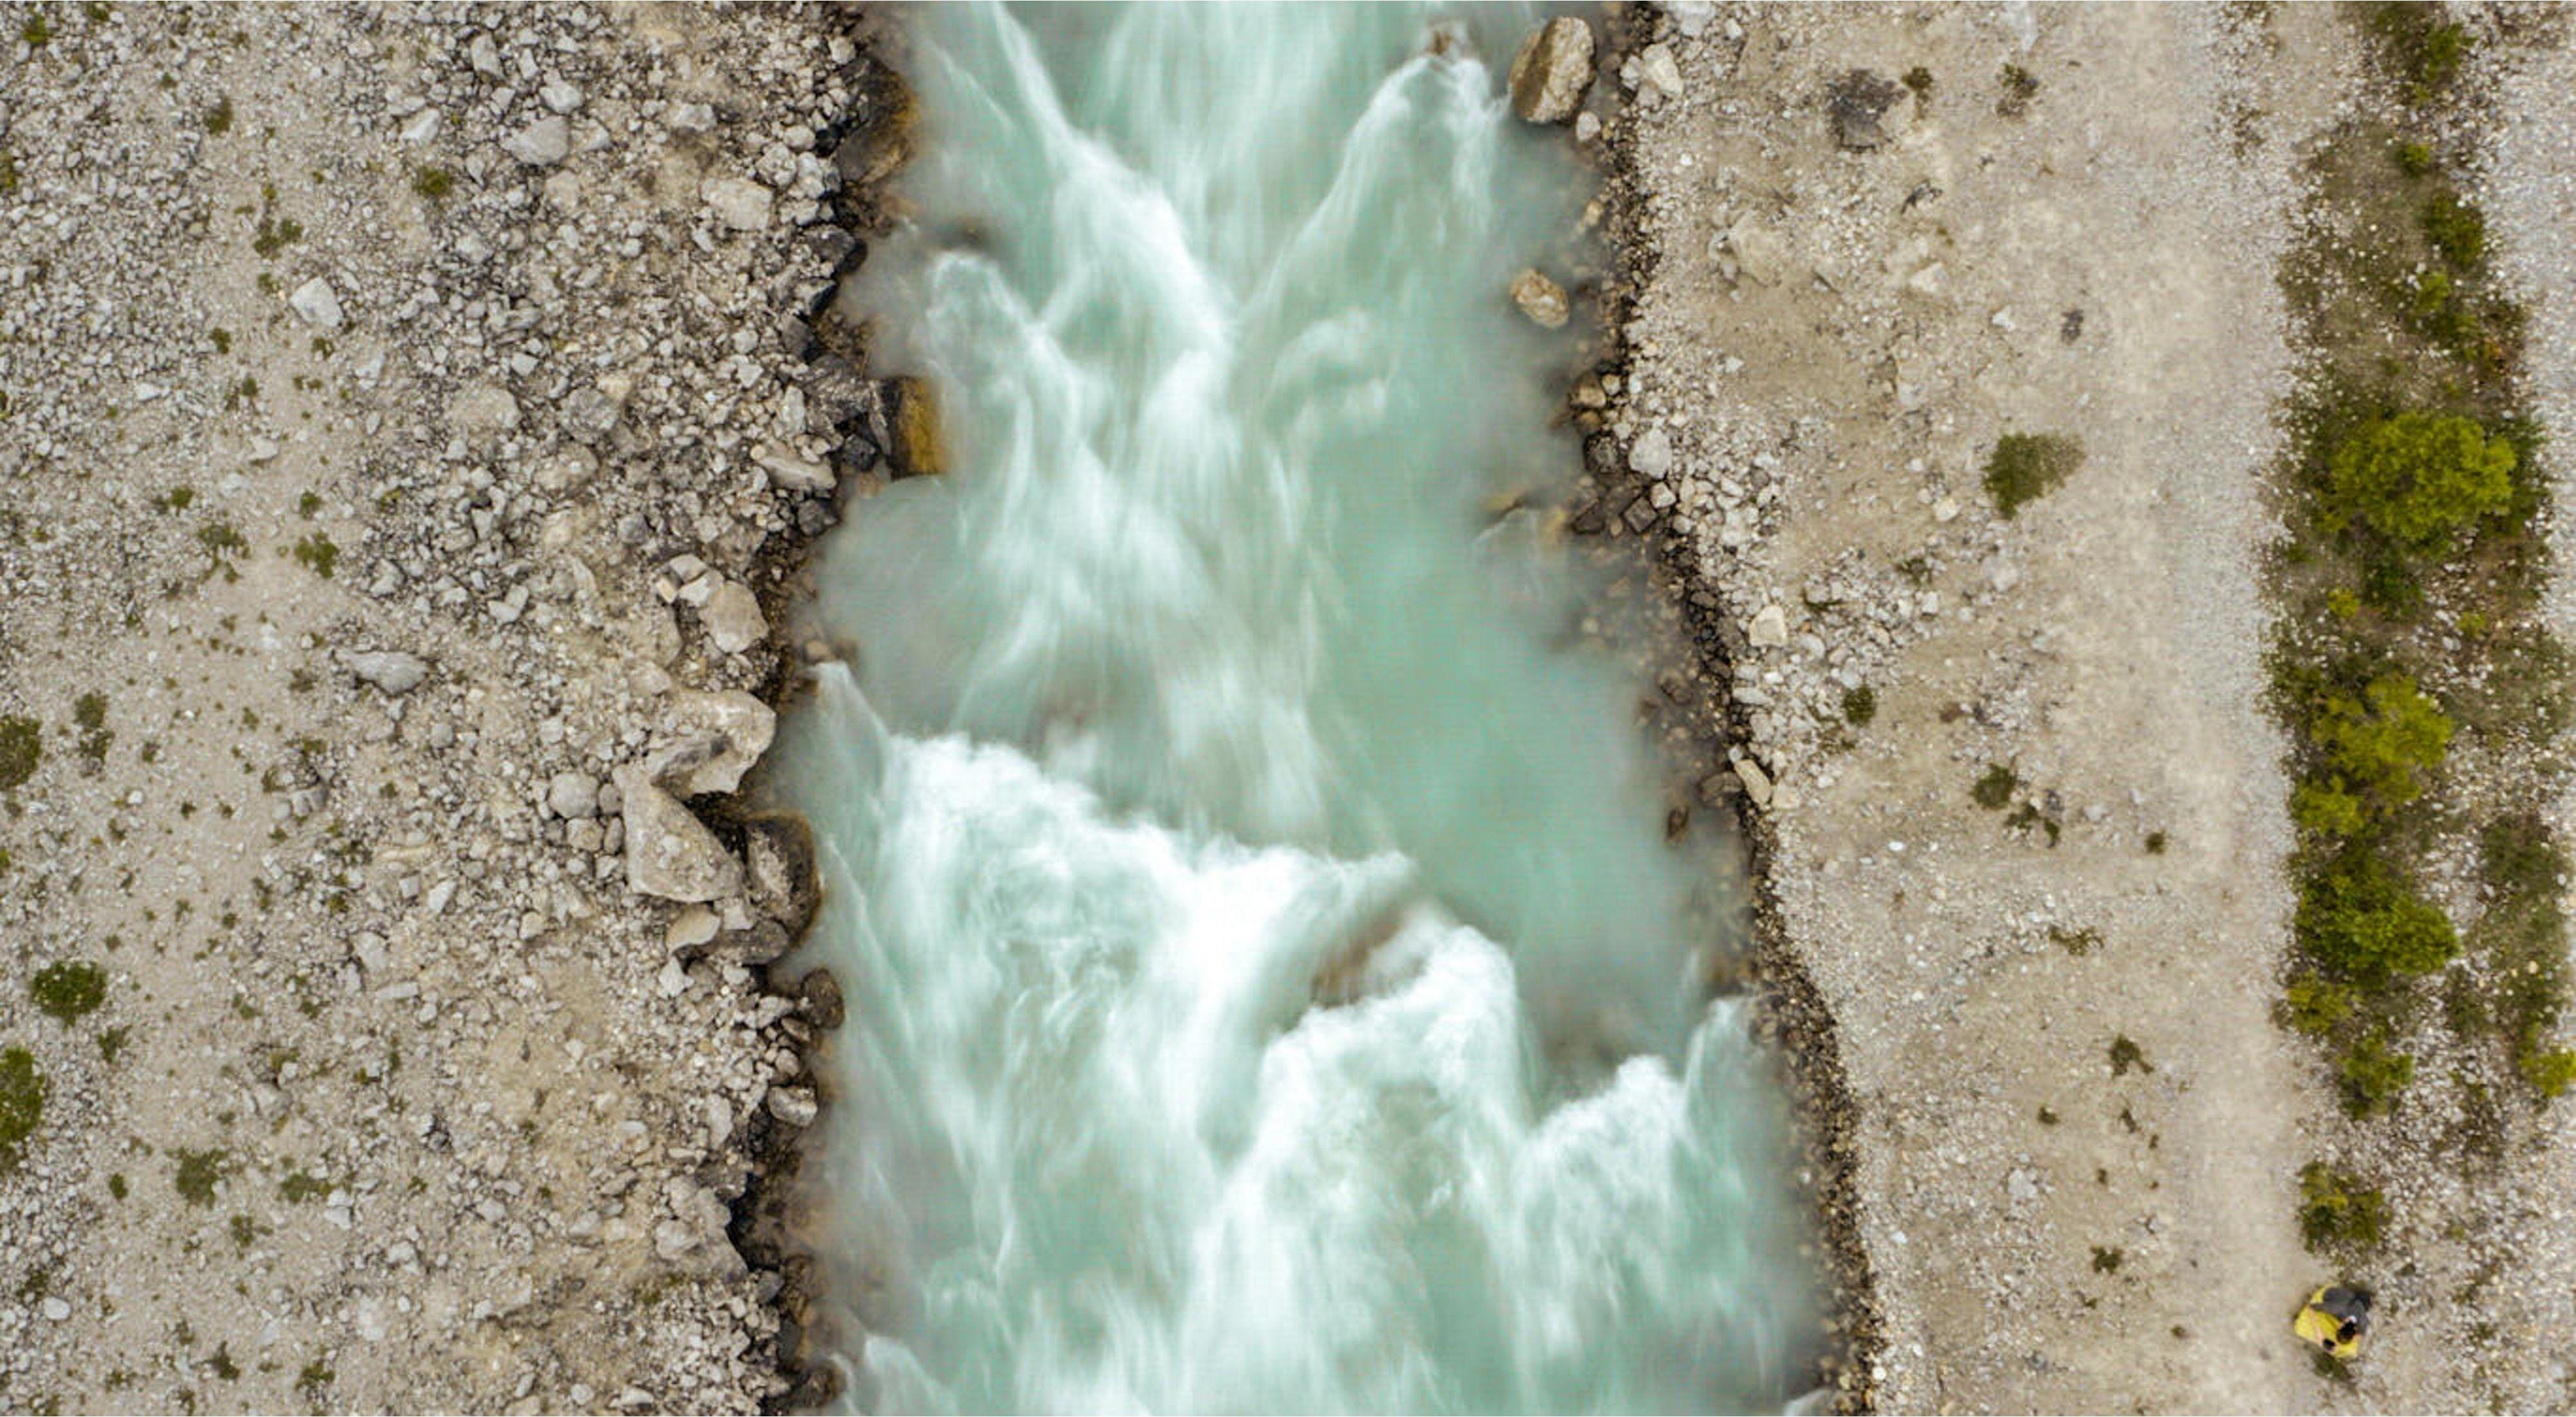 Glacier runoff near Golden